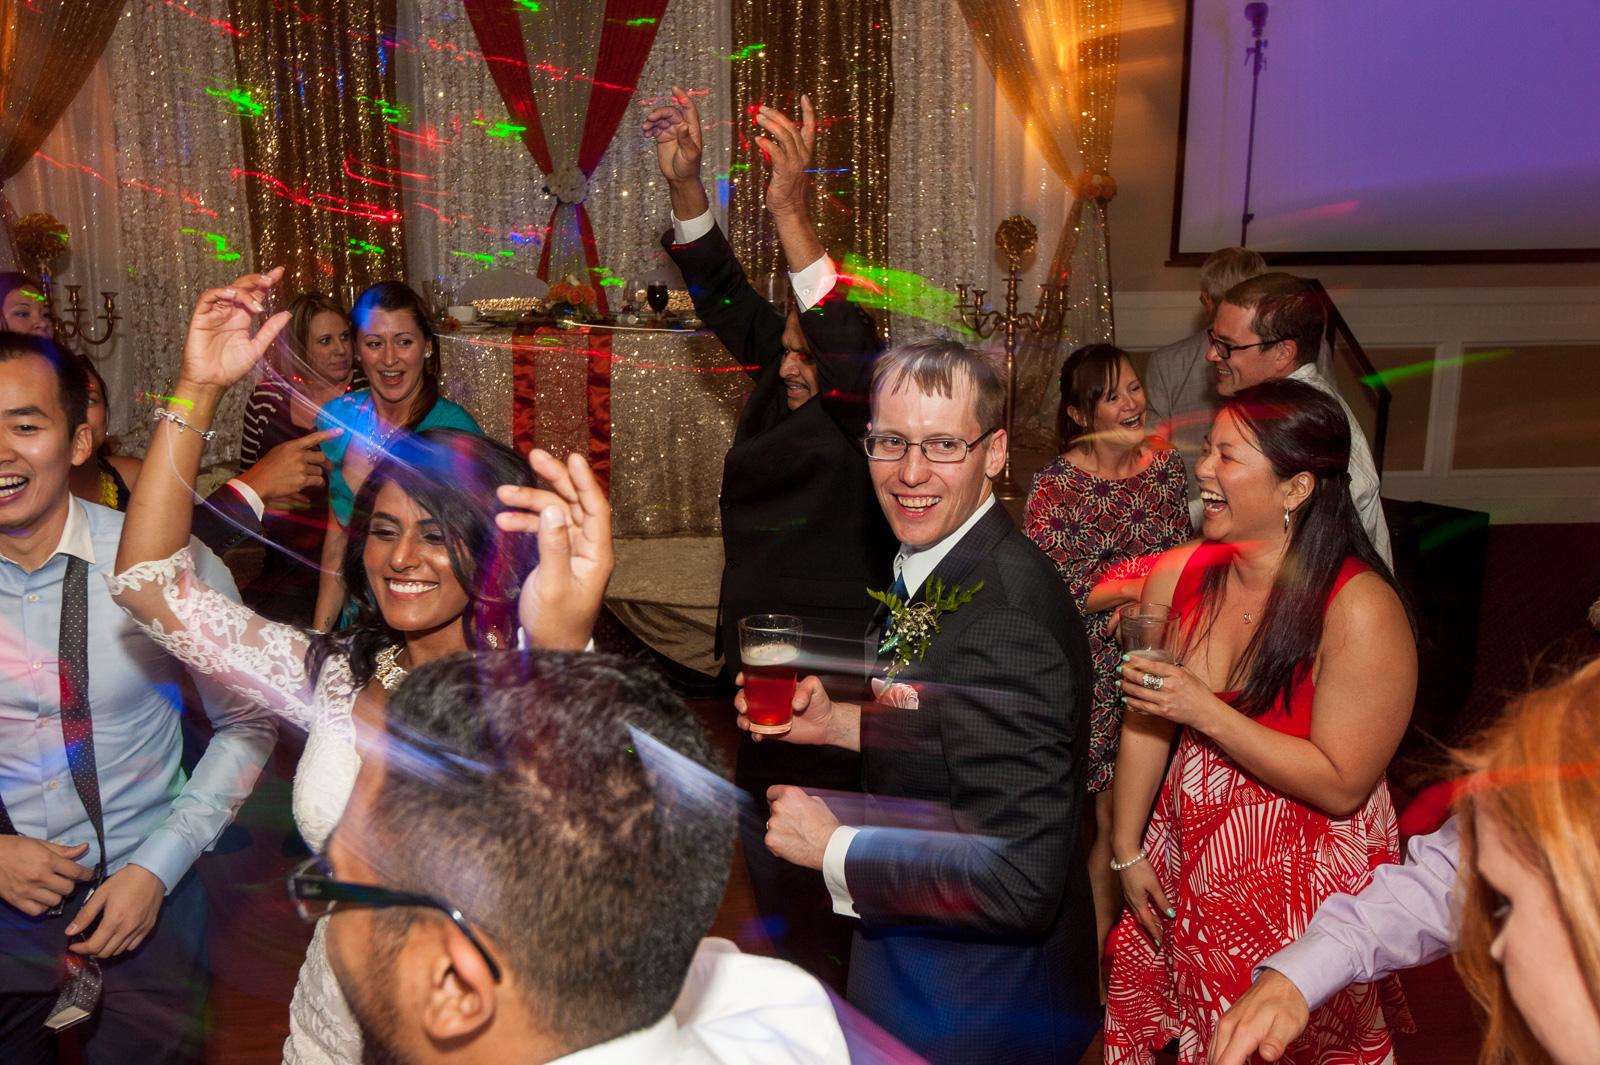 bc-wedding-photographers-paradise-banquet-hall-wedding-36.jpg